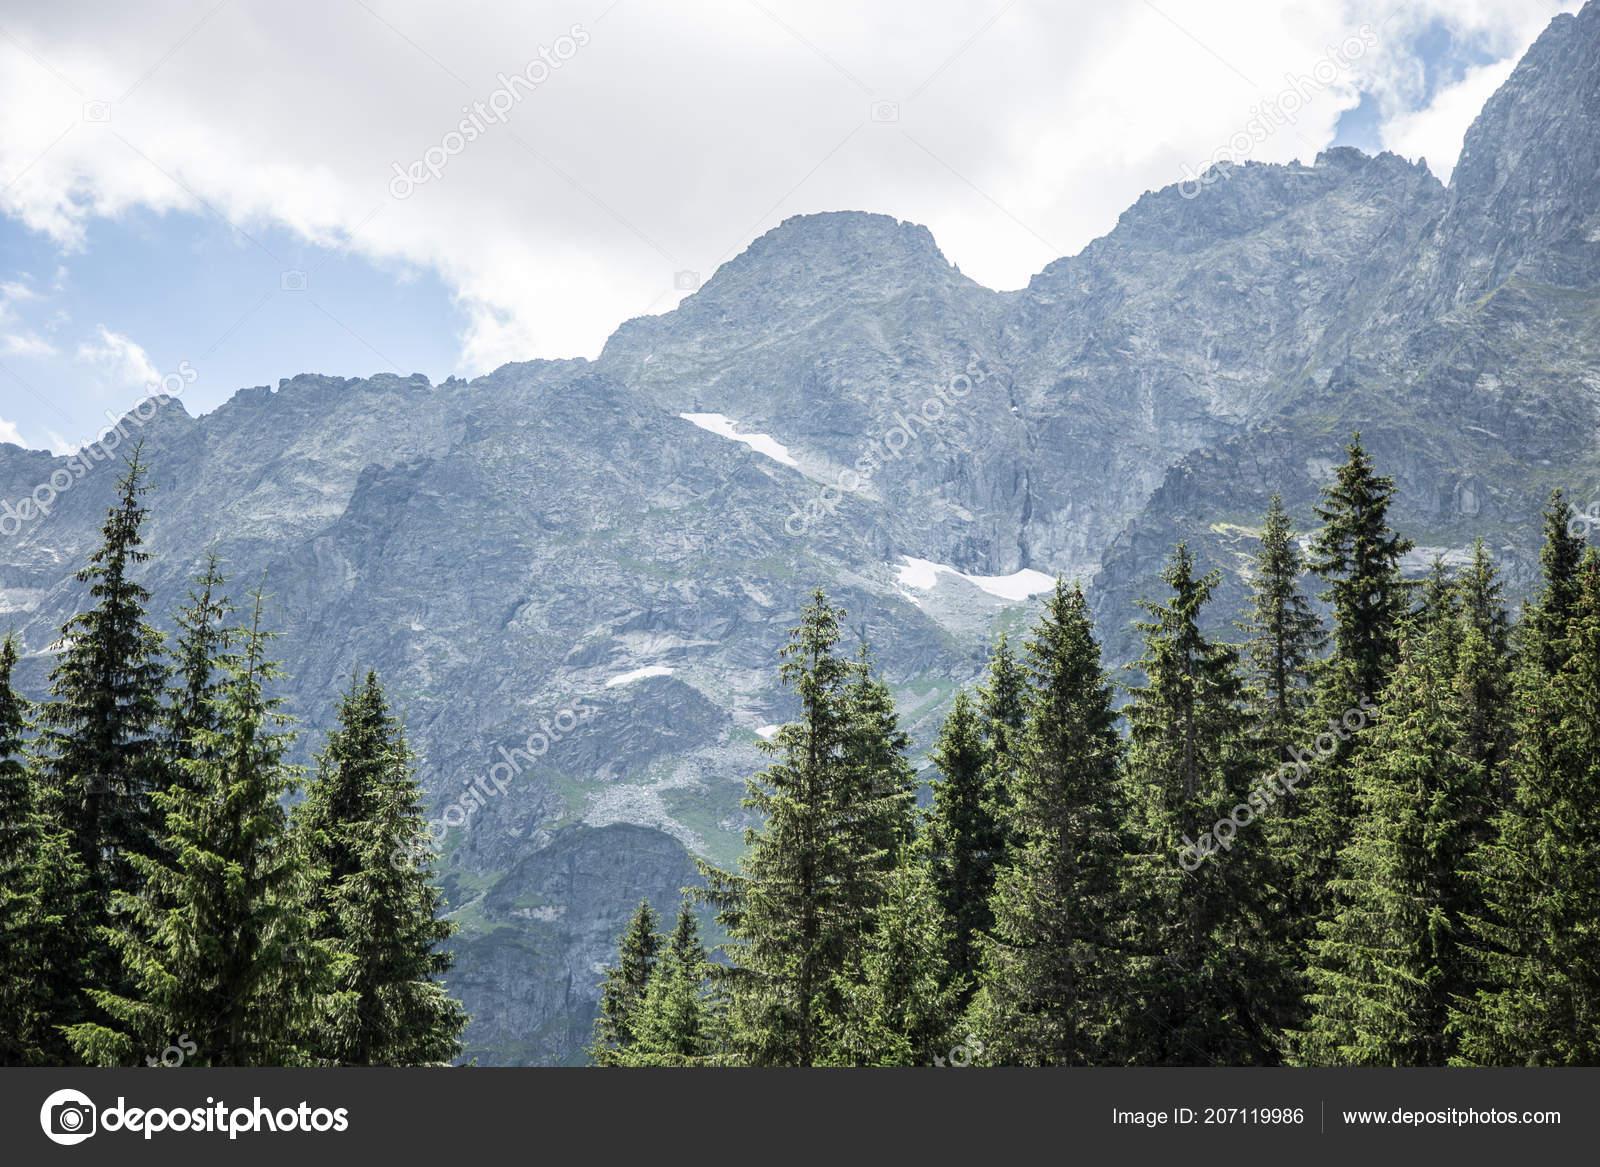 Mountain Landscape Trees Foreground Bright Mountains Card Stock Photo Image By C Elenaruban Ua Fm 207119986